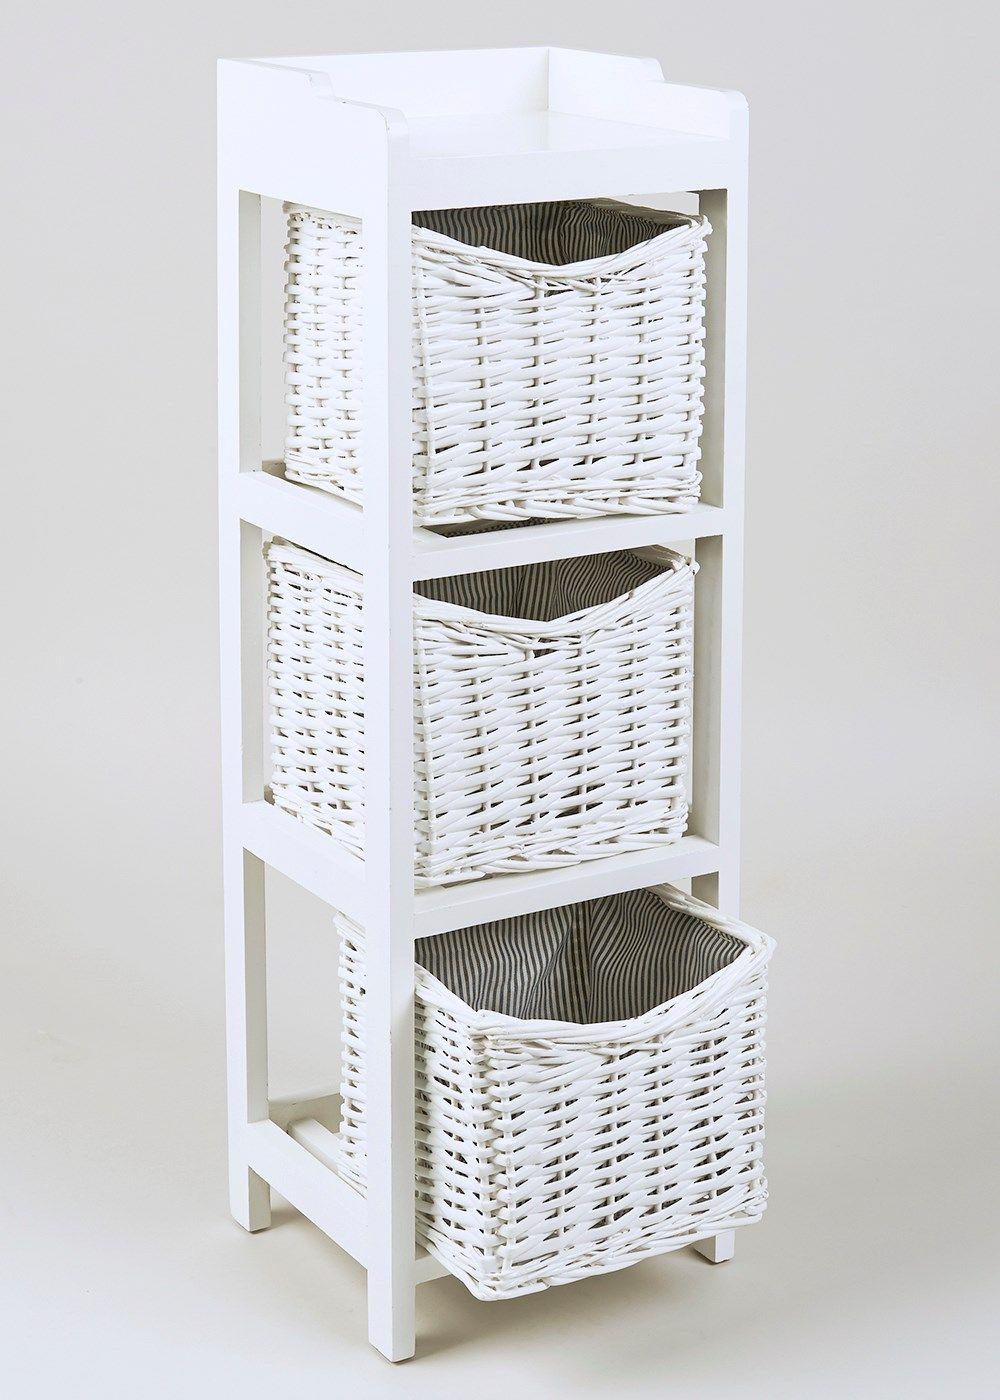 Wicker 5 Drawer Wooden Tower Unit (5cm x 25cm x 5cm) - Matalan